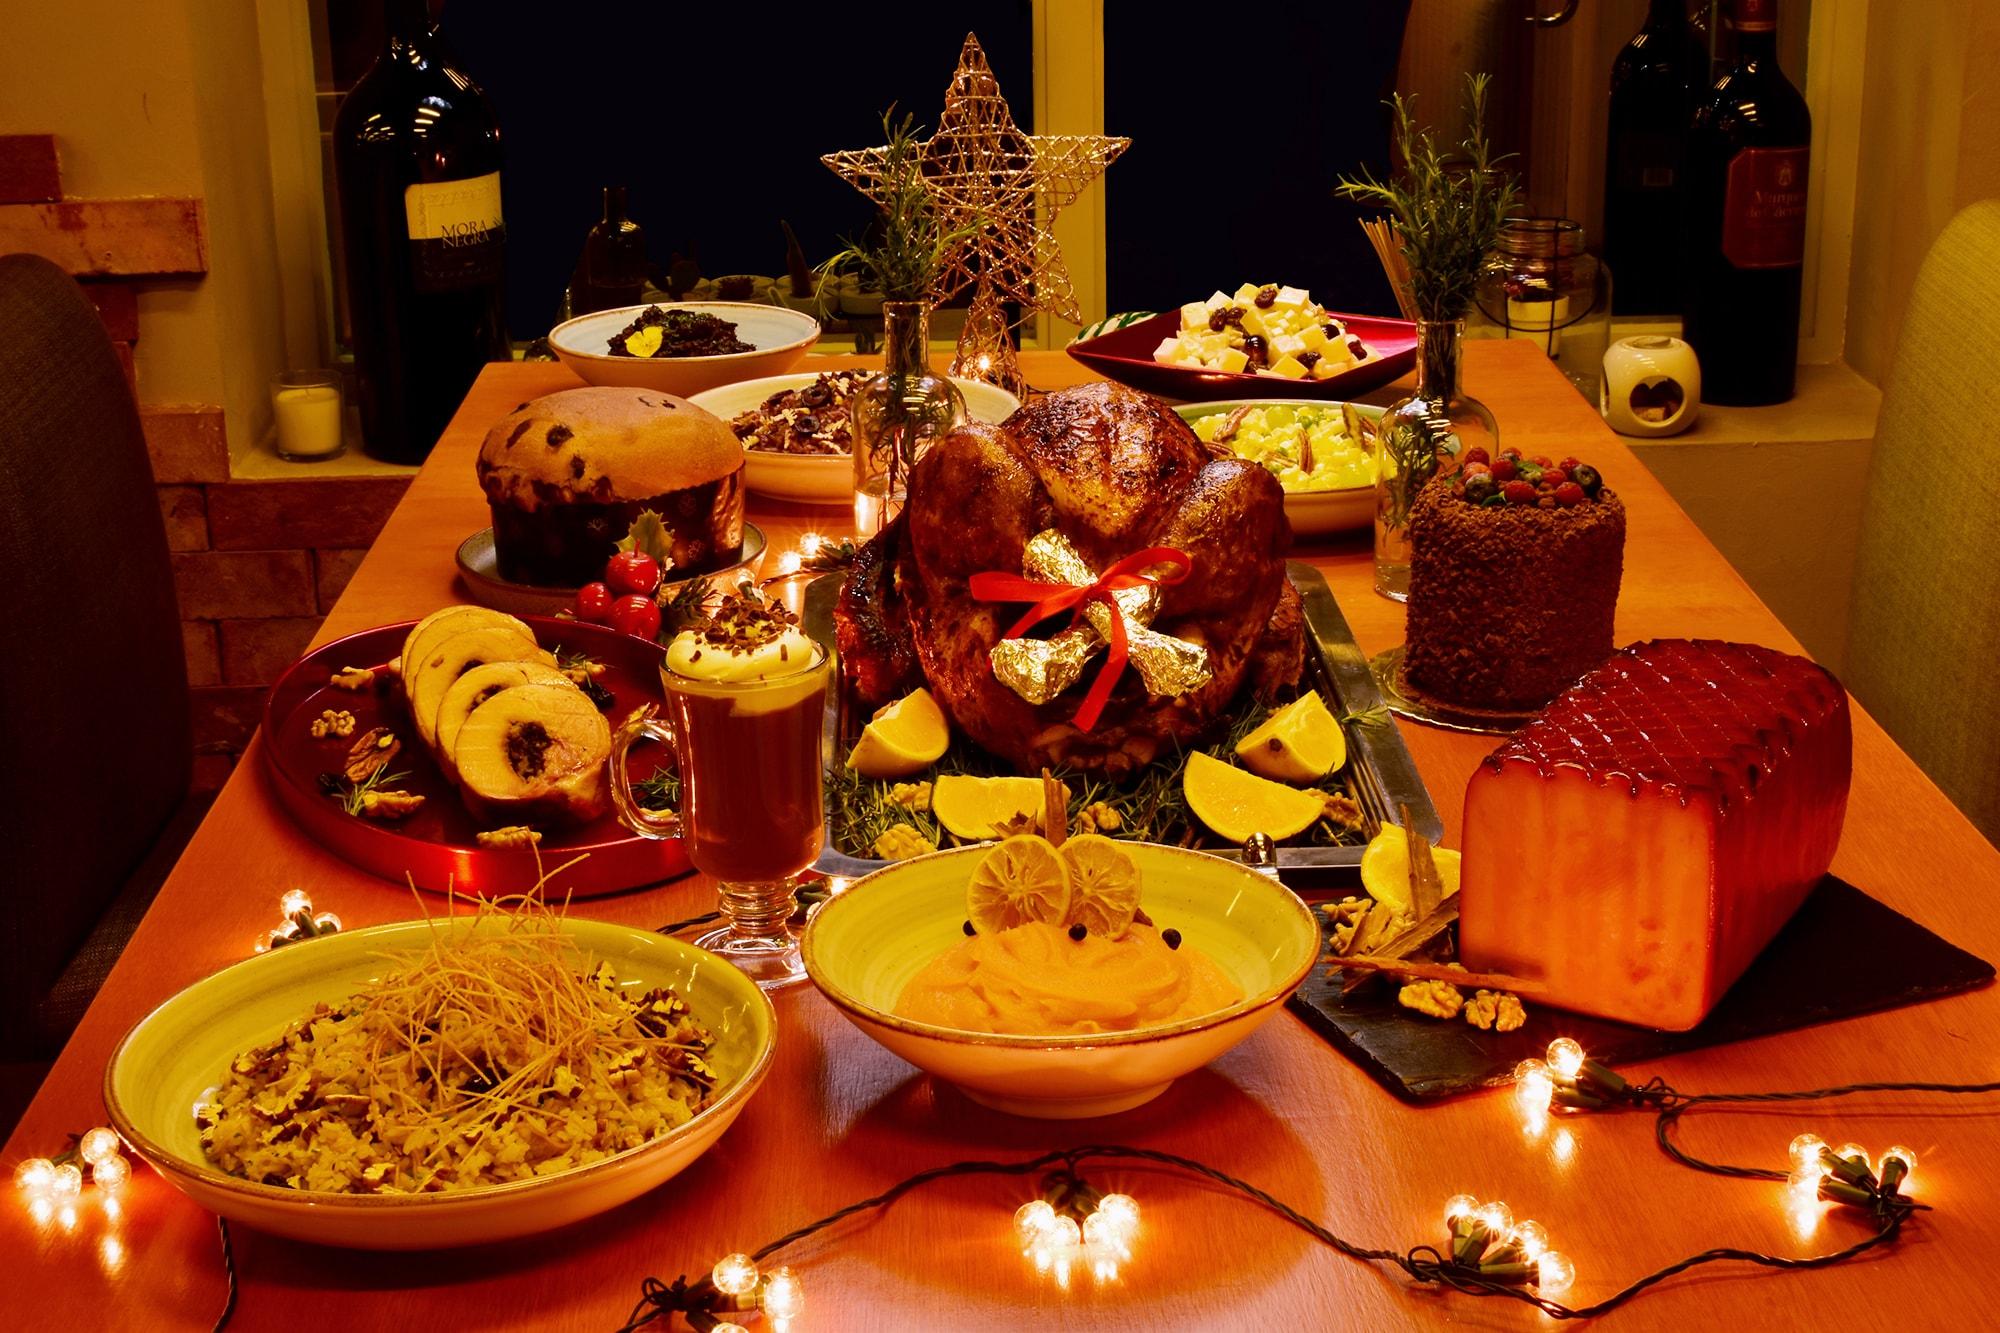 Wallqa Restaurante presenta sus cenas navideñas